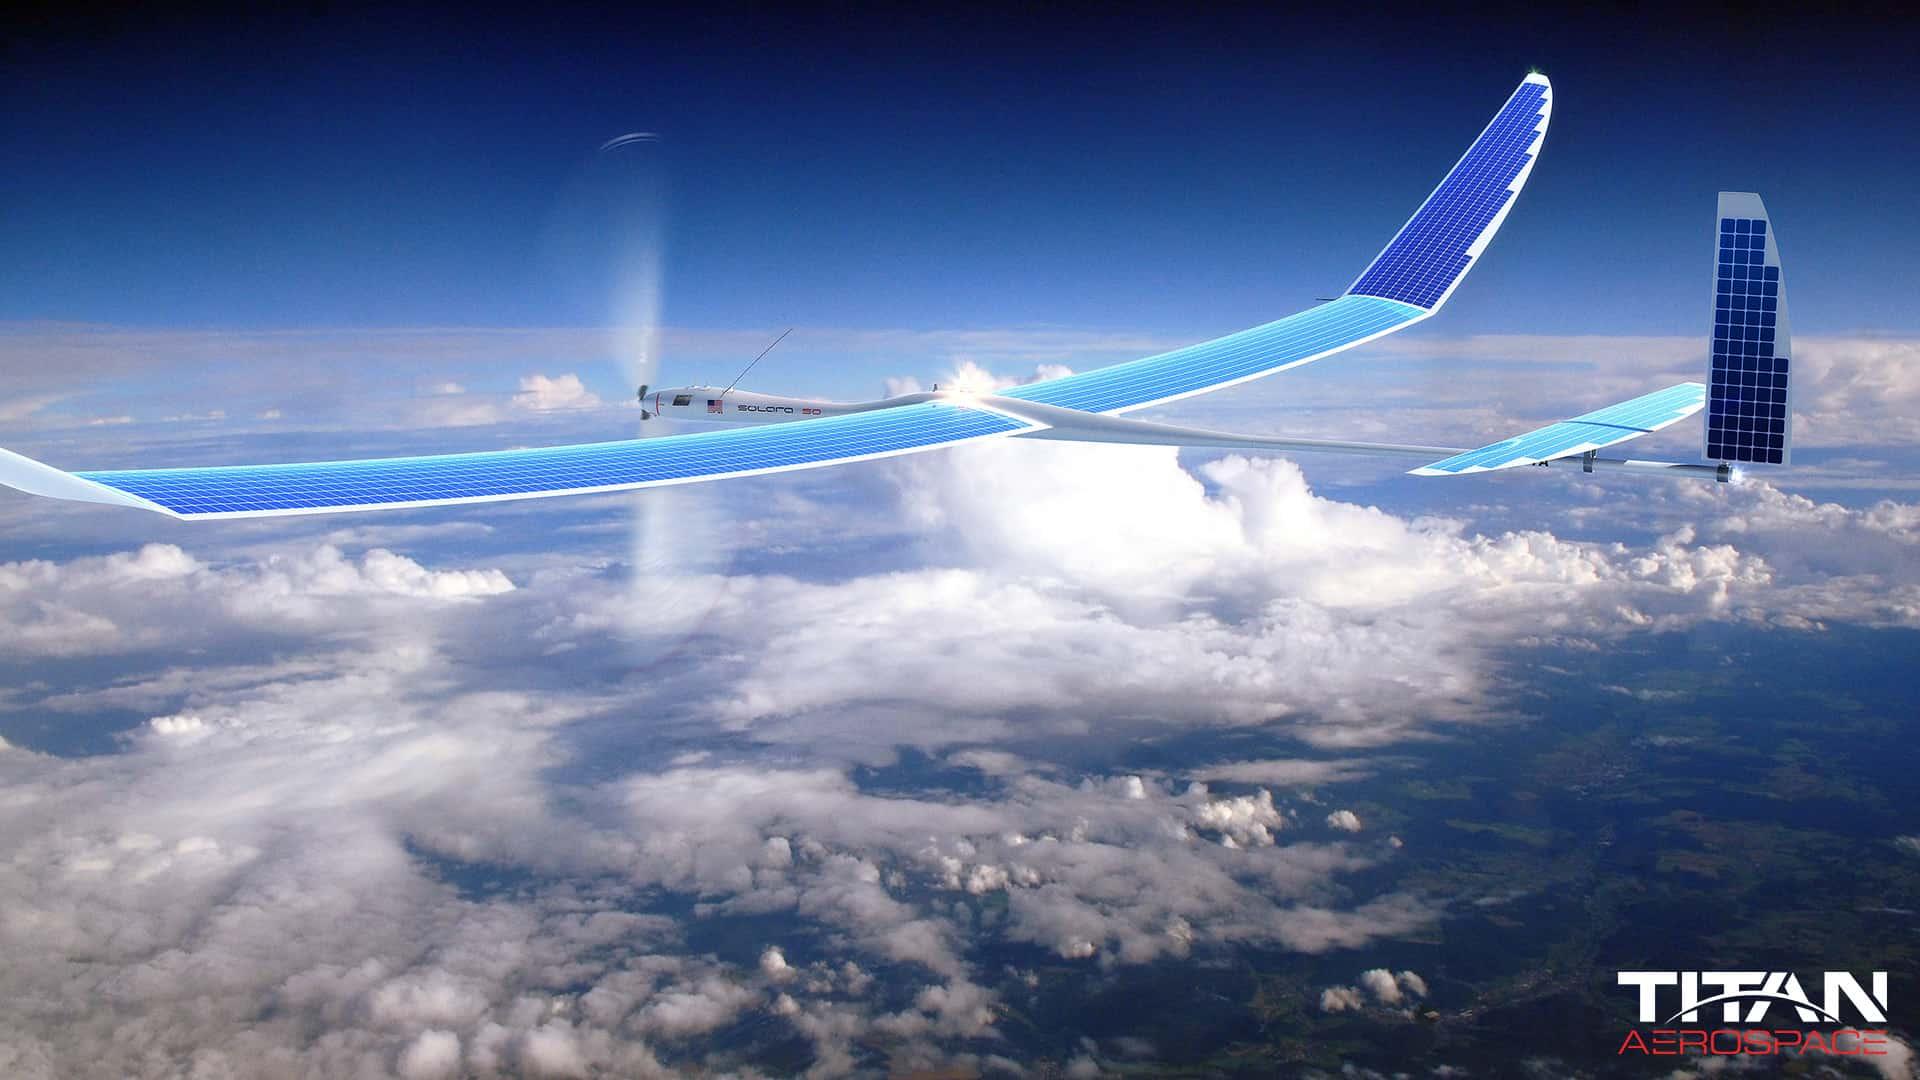 titan aerospace drone solaire google internet